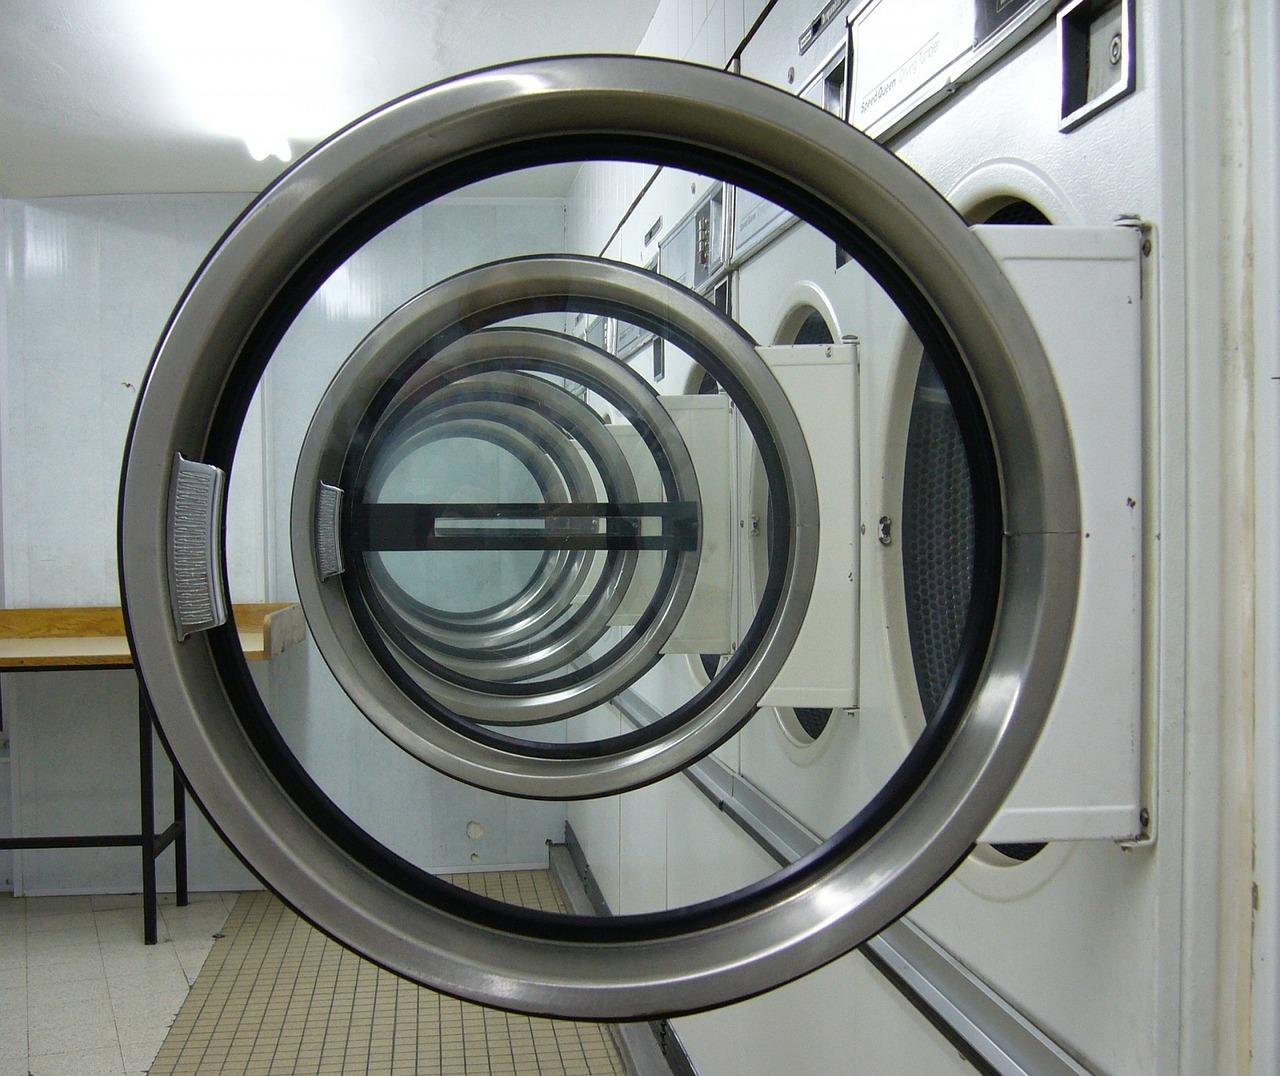 laundromat-315374_1280